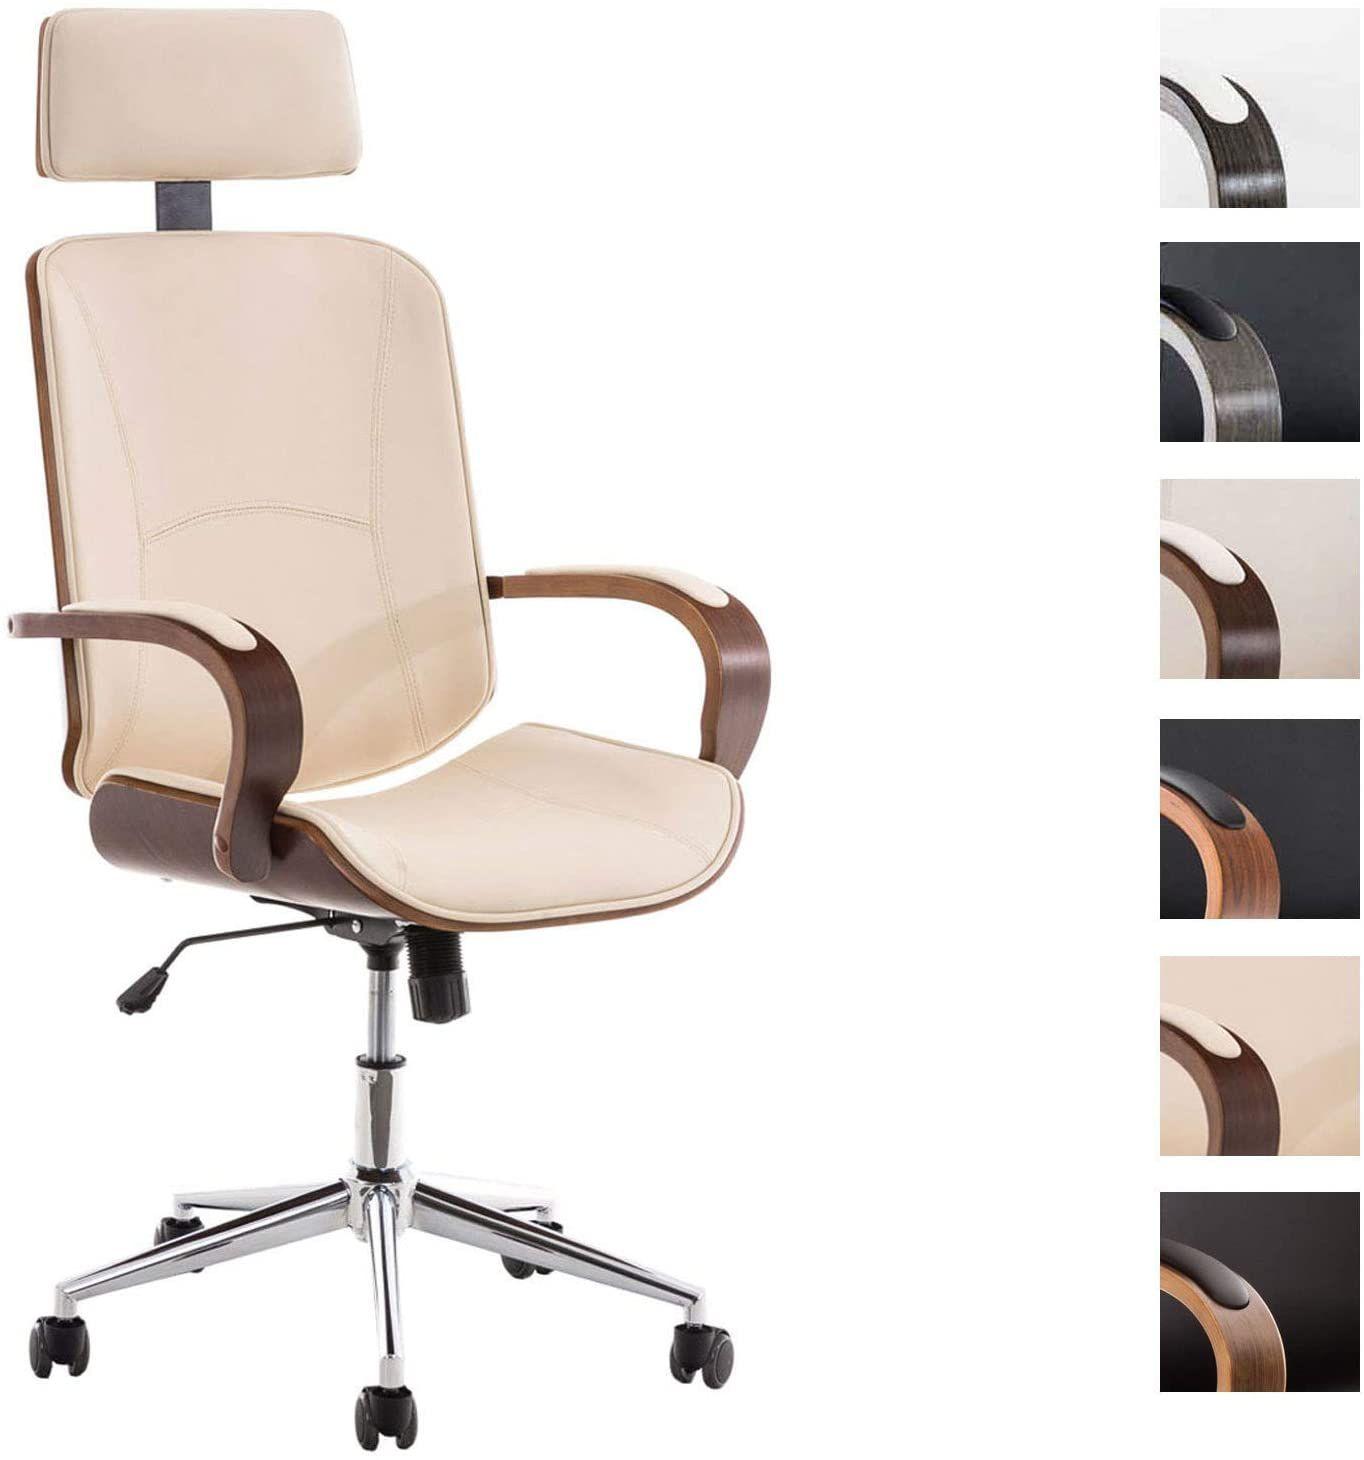 clp fauteuil de bureau ergonomique